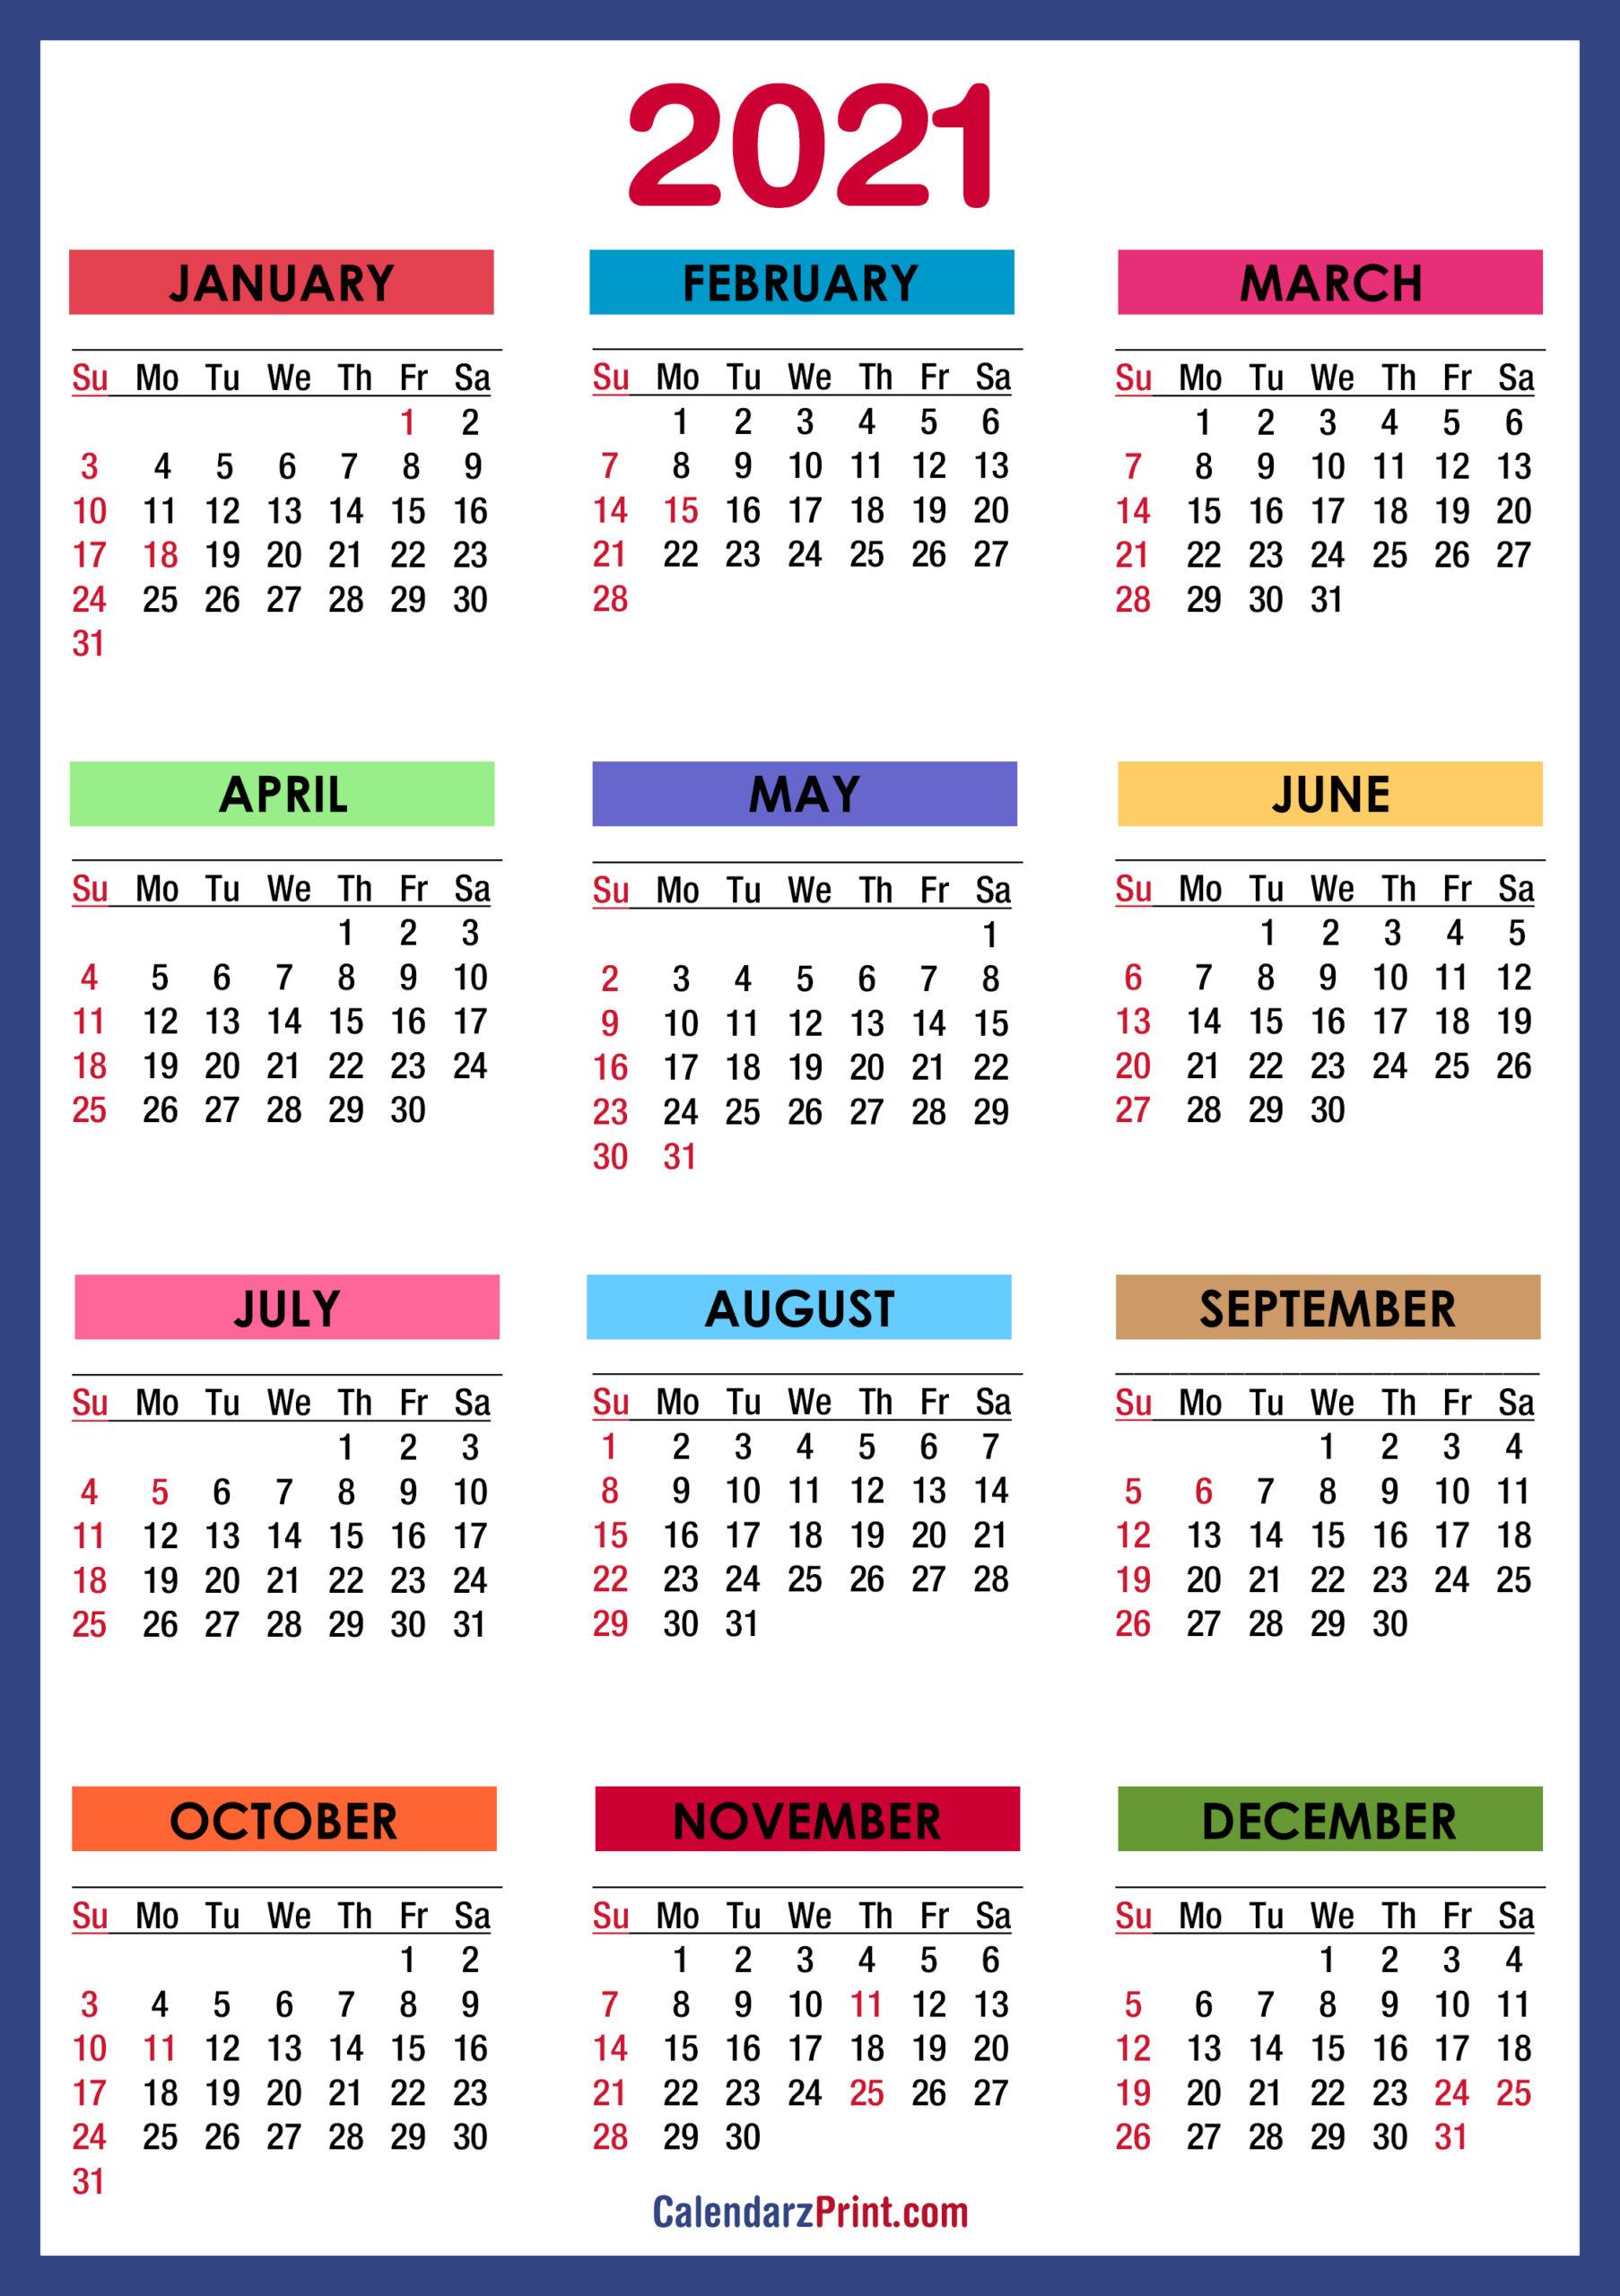 2021 Calendar Printable Pdf With Holidays   2021 Printable For 2021 Calendar With Federal Printabl